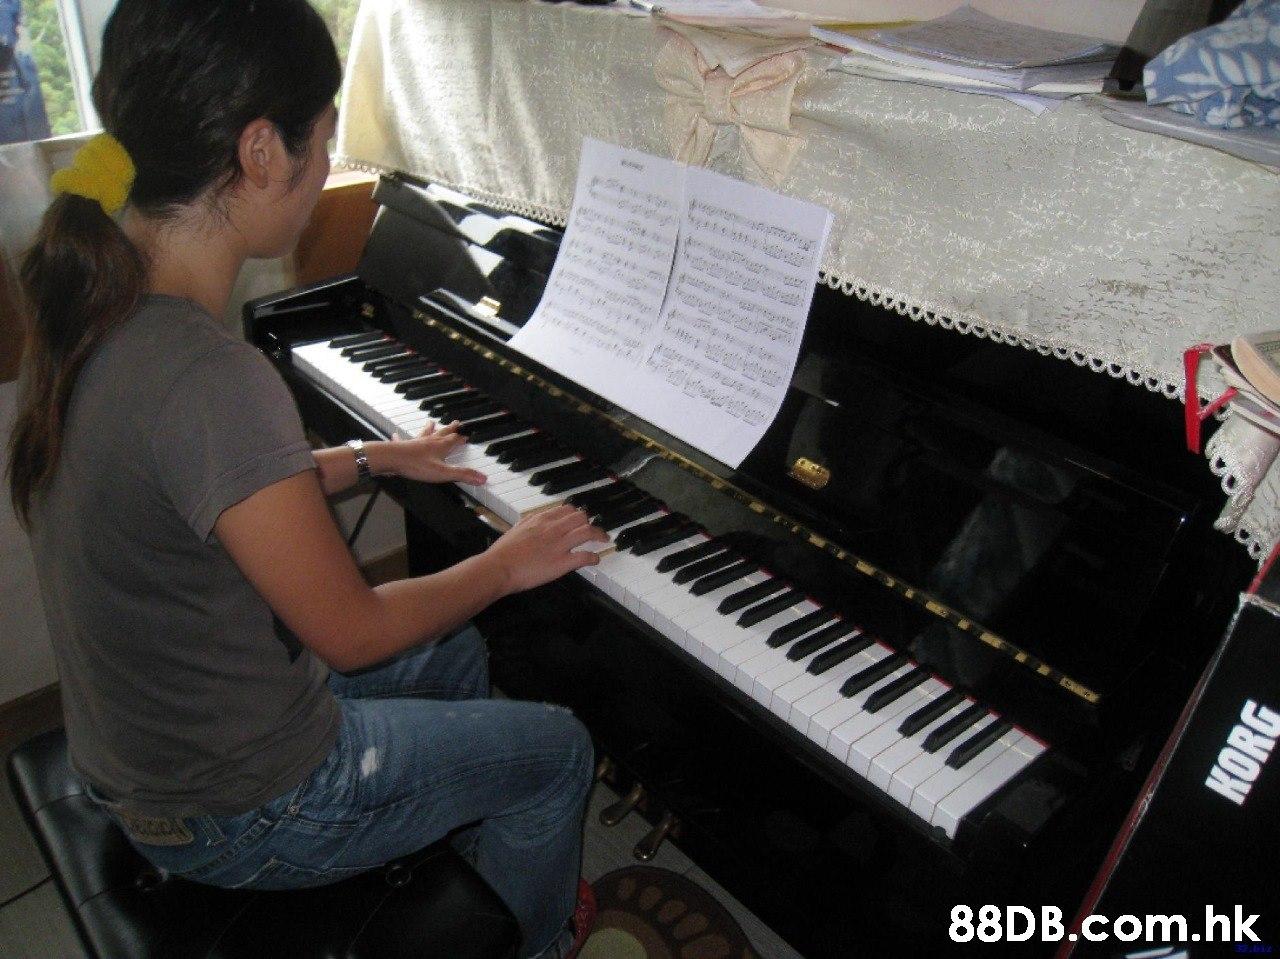 torutrtre CICE .hk KORG  Musical instrument,Piano,Electronic instrument,Musical keyboard,Keyboard